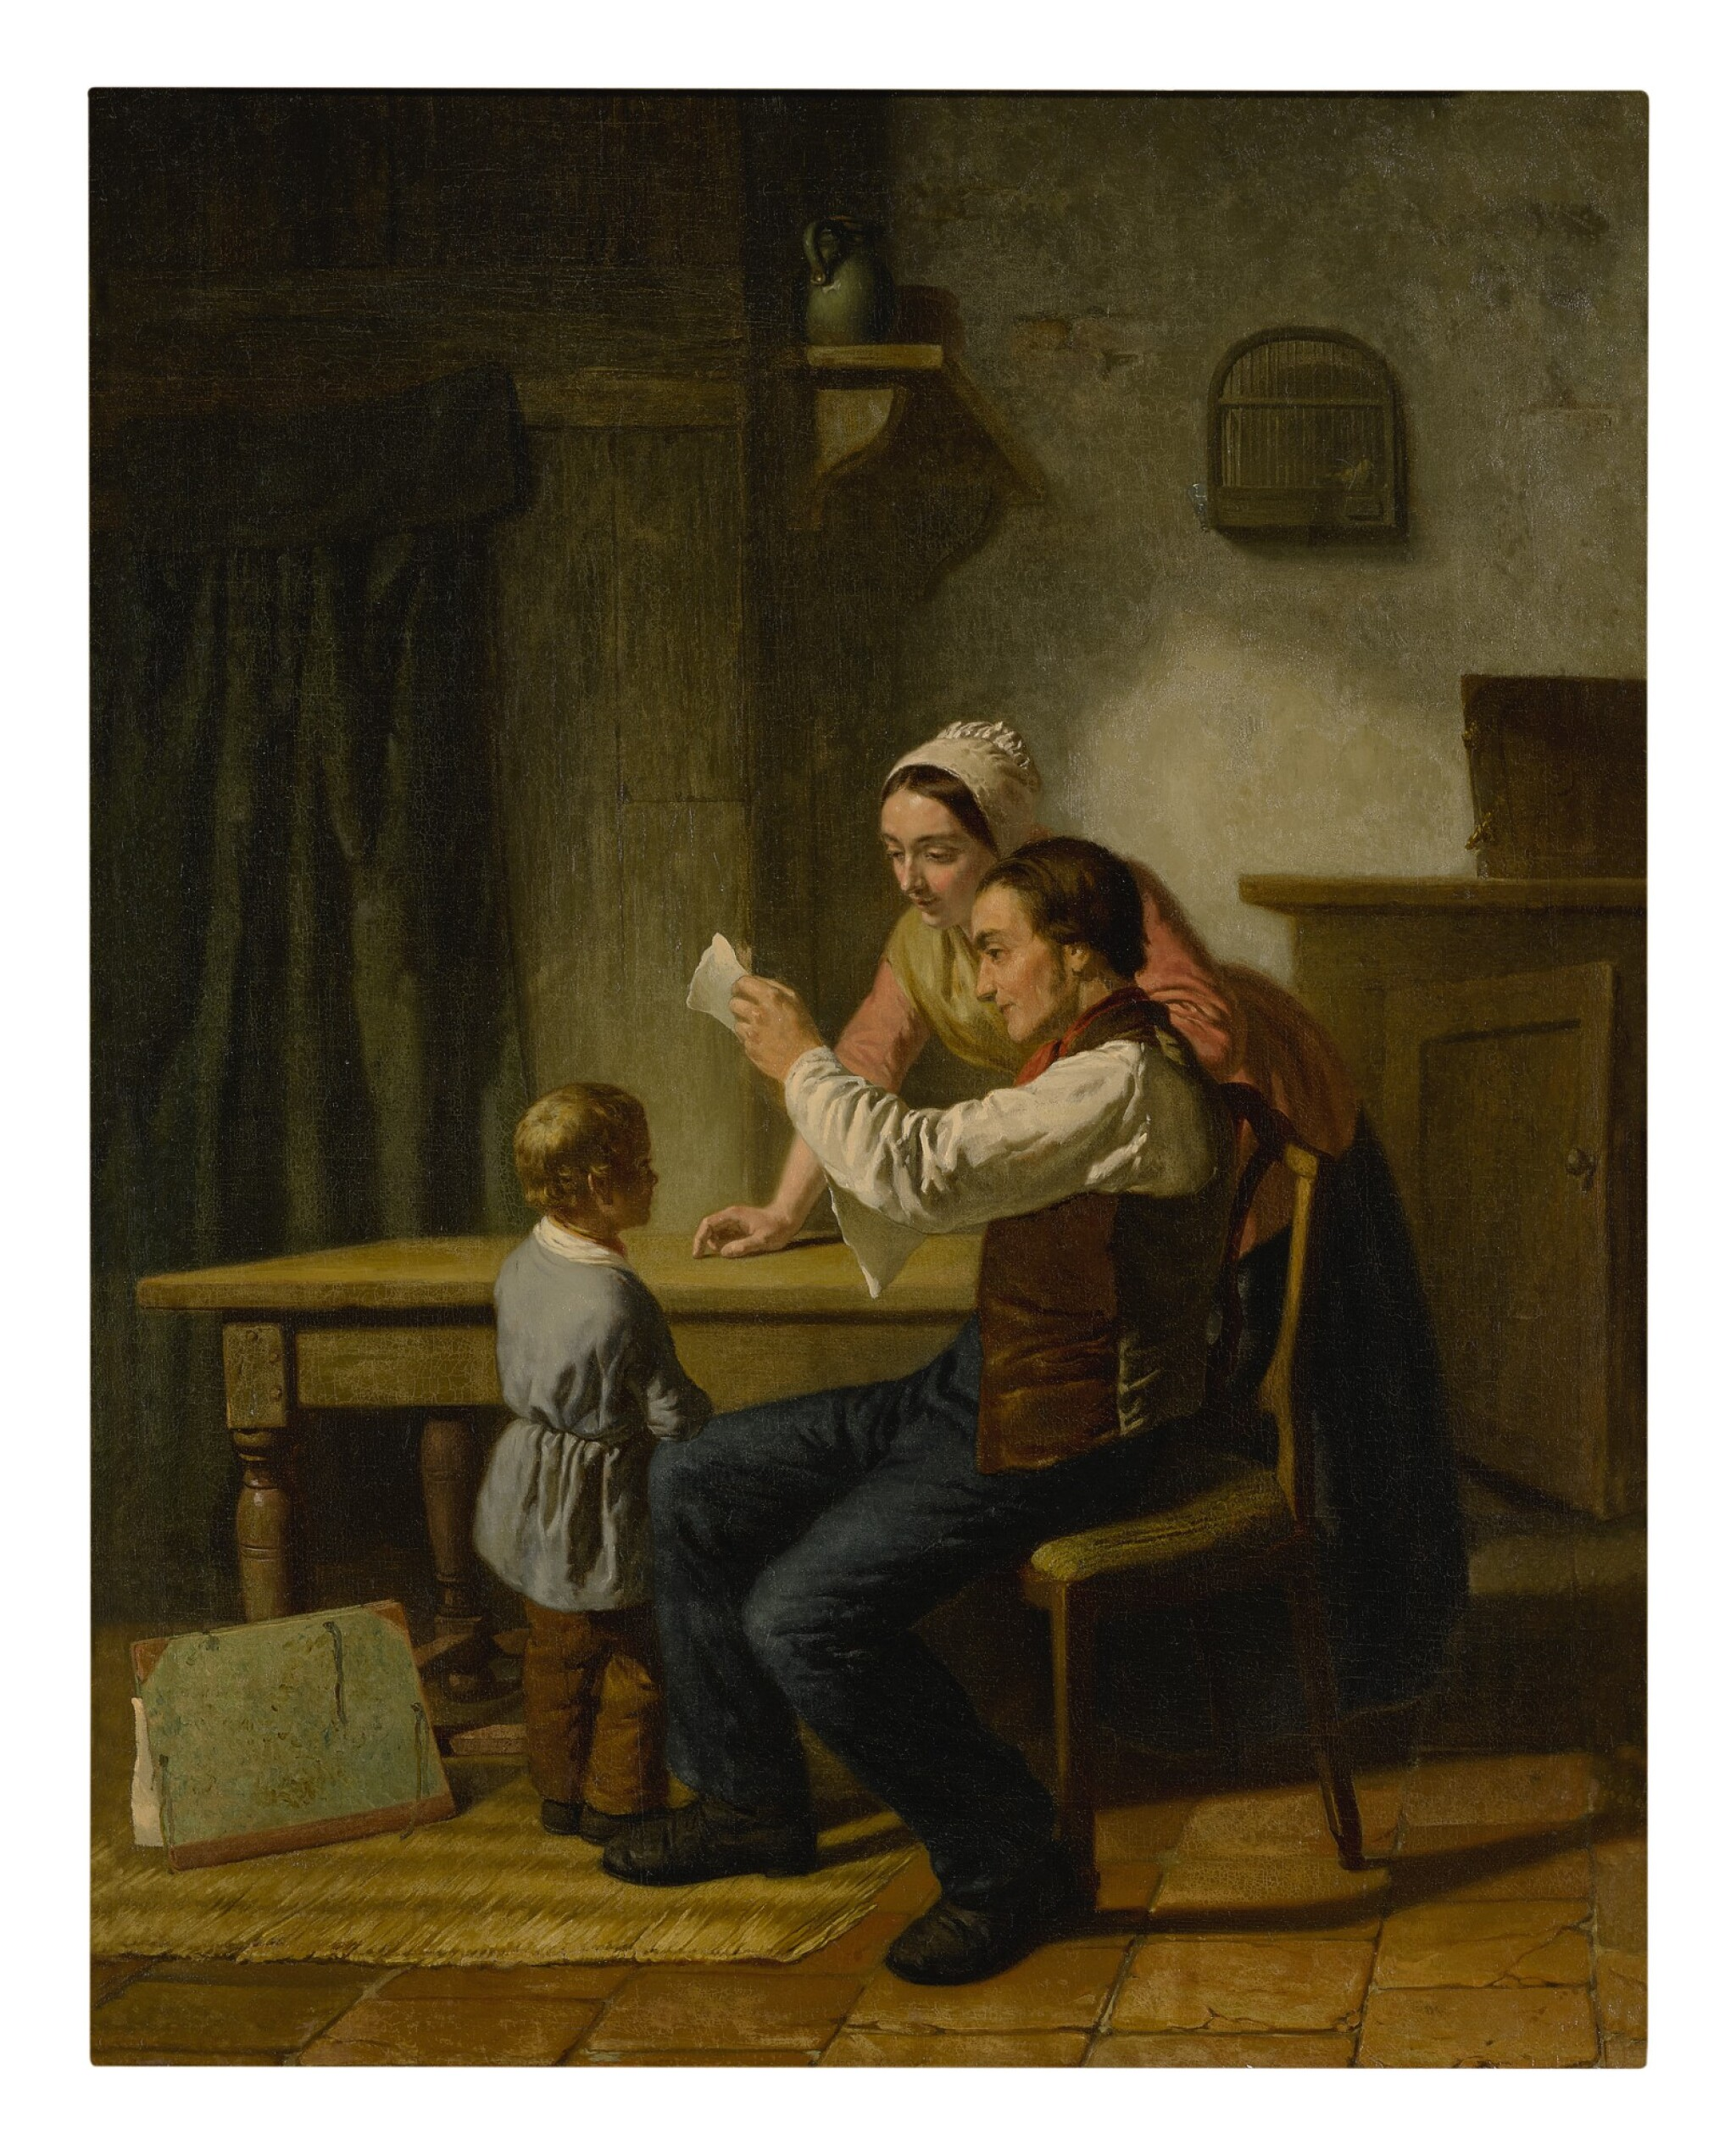 CONTINENTAL SCHOOL, 19TH CENTURY | THE SCHOOL REPORT